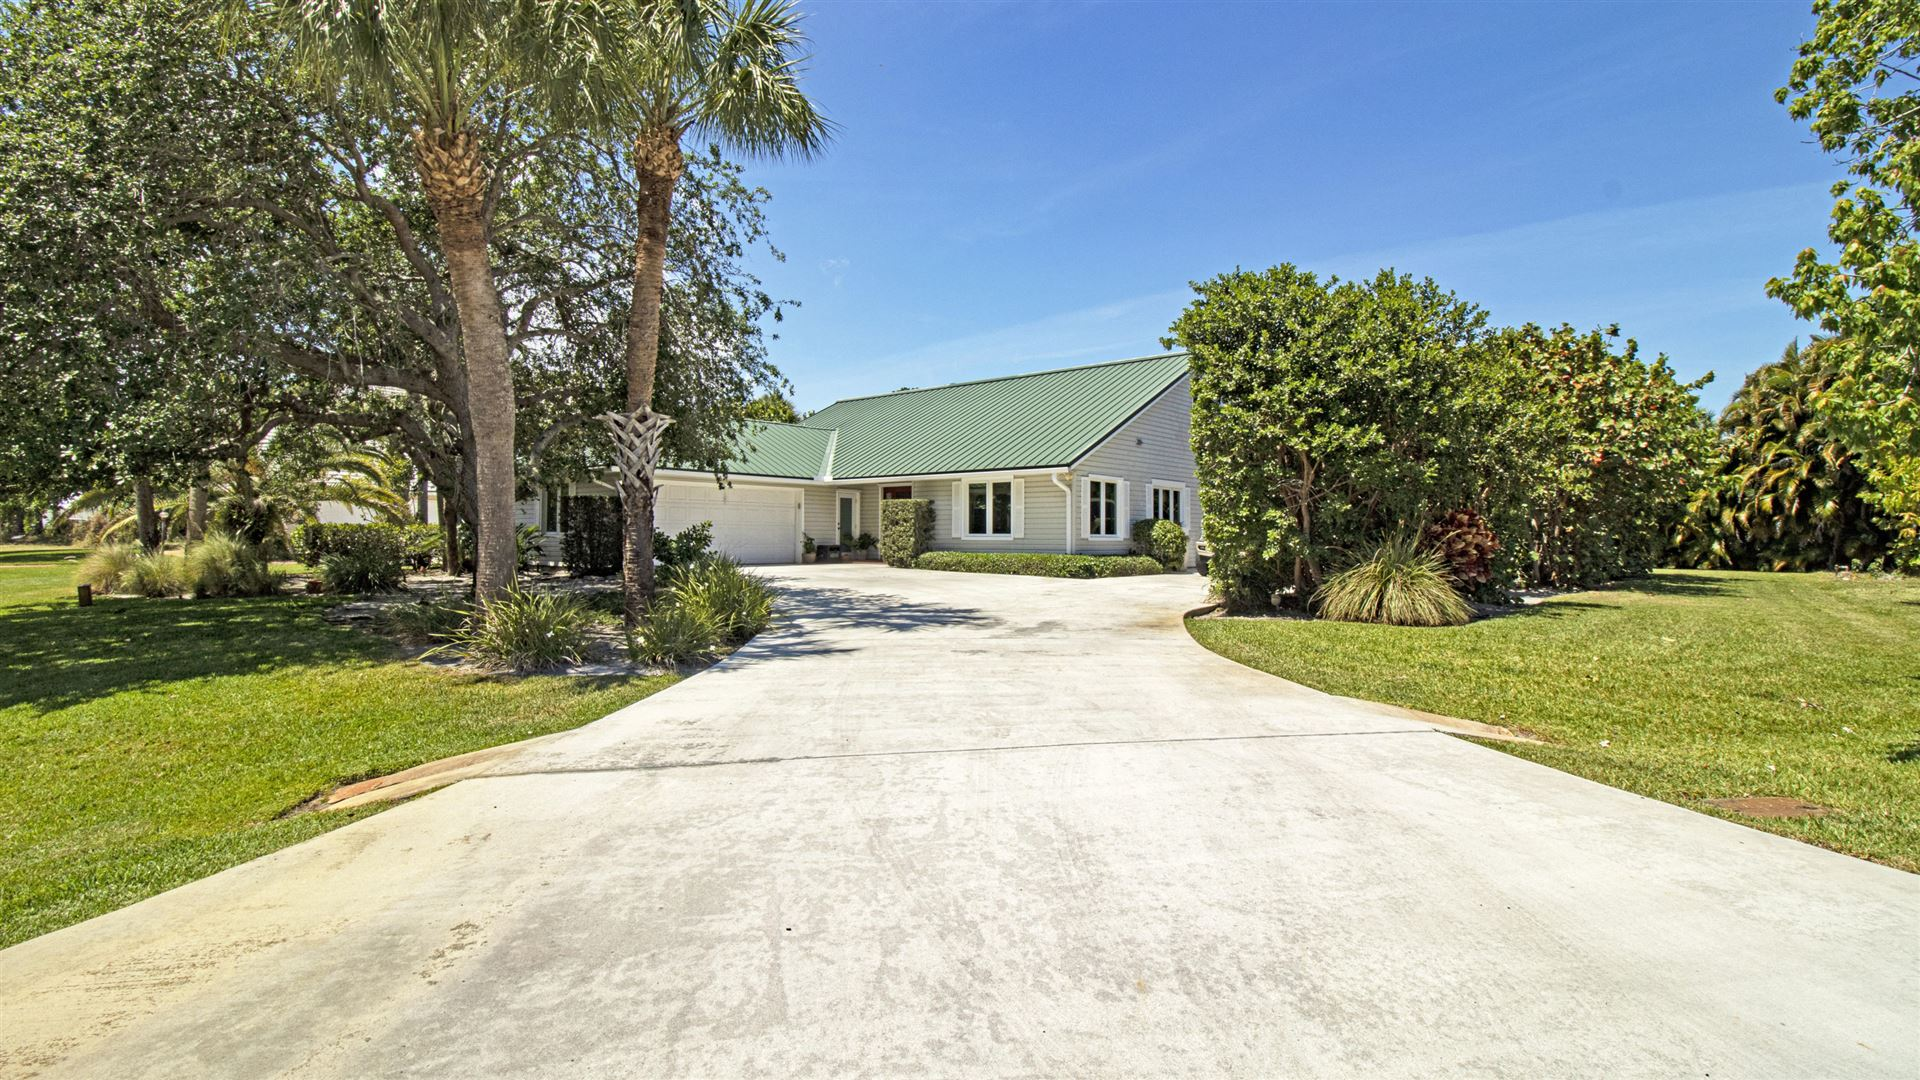 8589 SE Wilkes Place, Hobe Sound, FL 33455 - #: RX-10706214